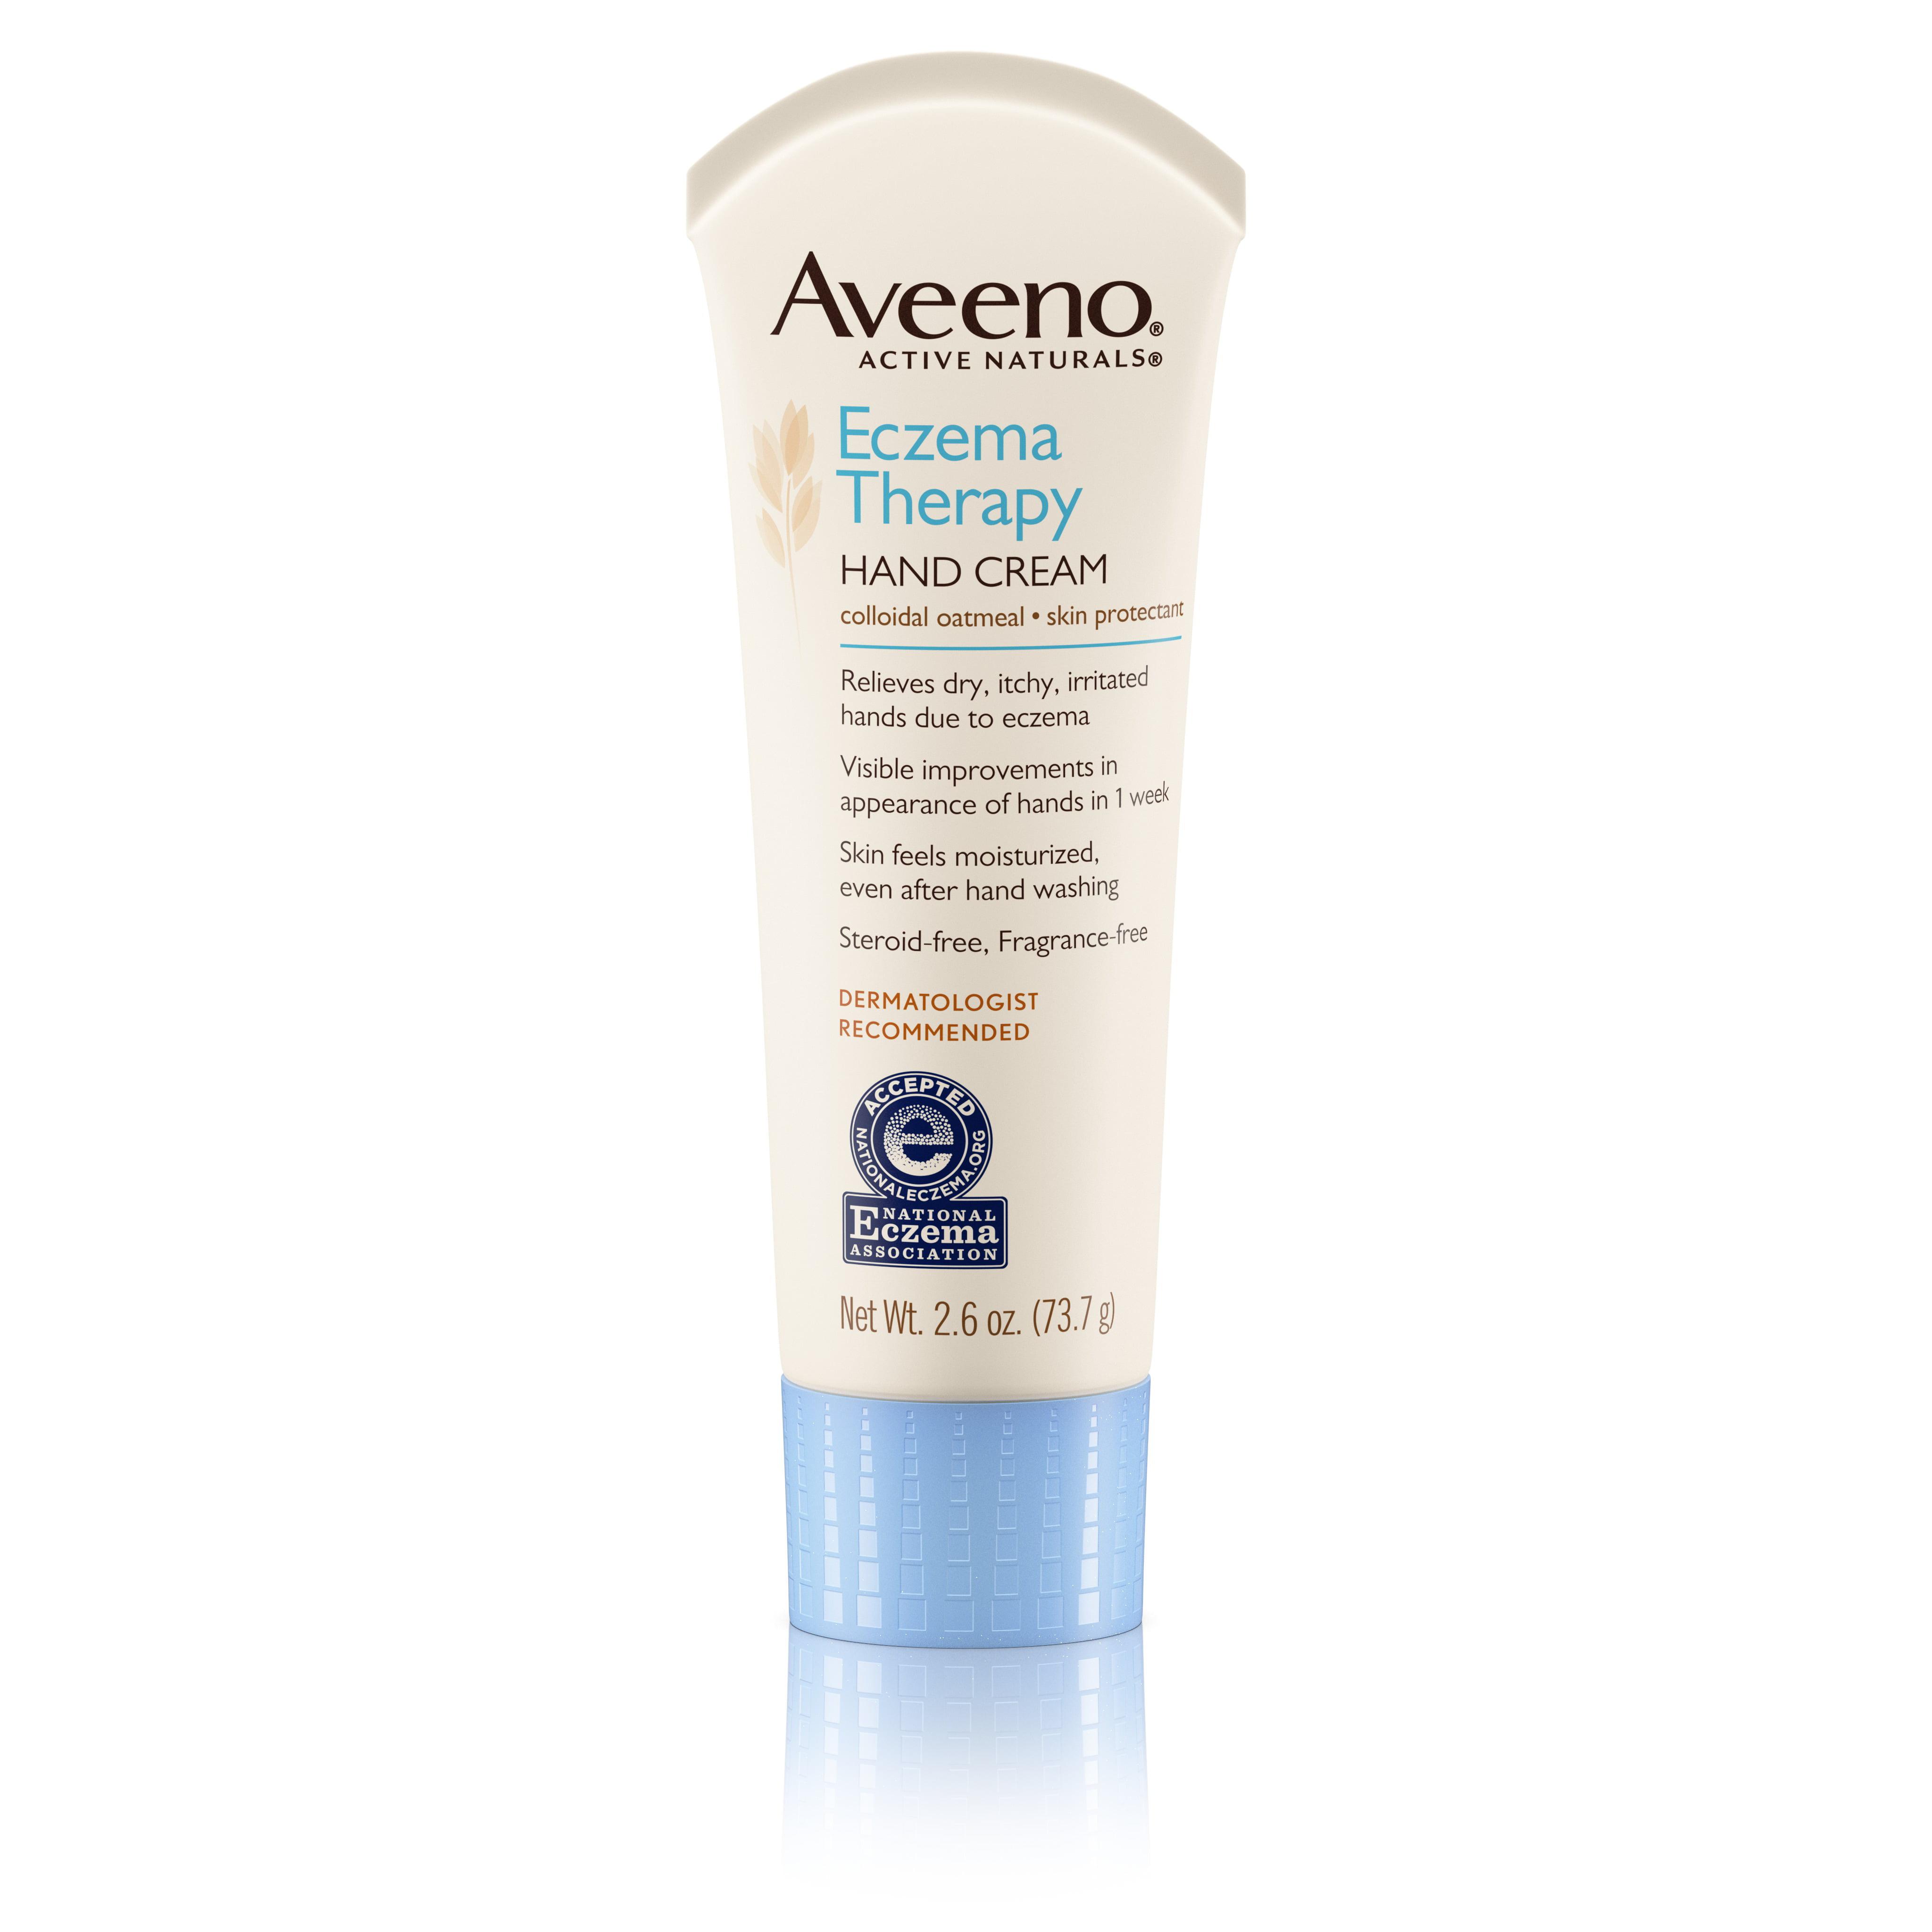 Aveeno Eczema Therapy Hand Cream, 2.6 Oz - Walmart.com